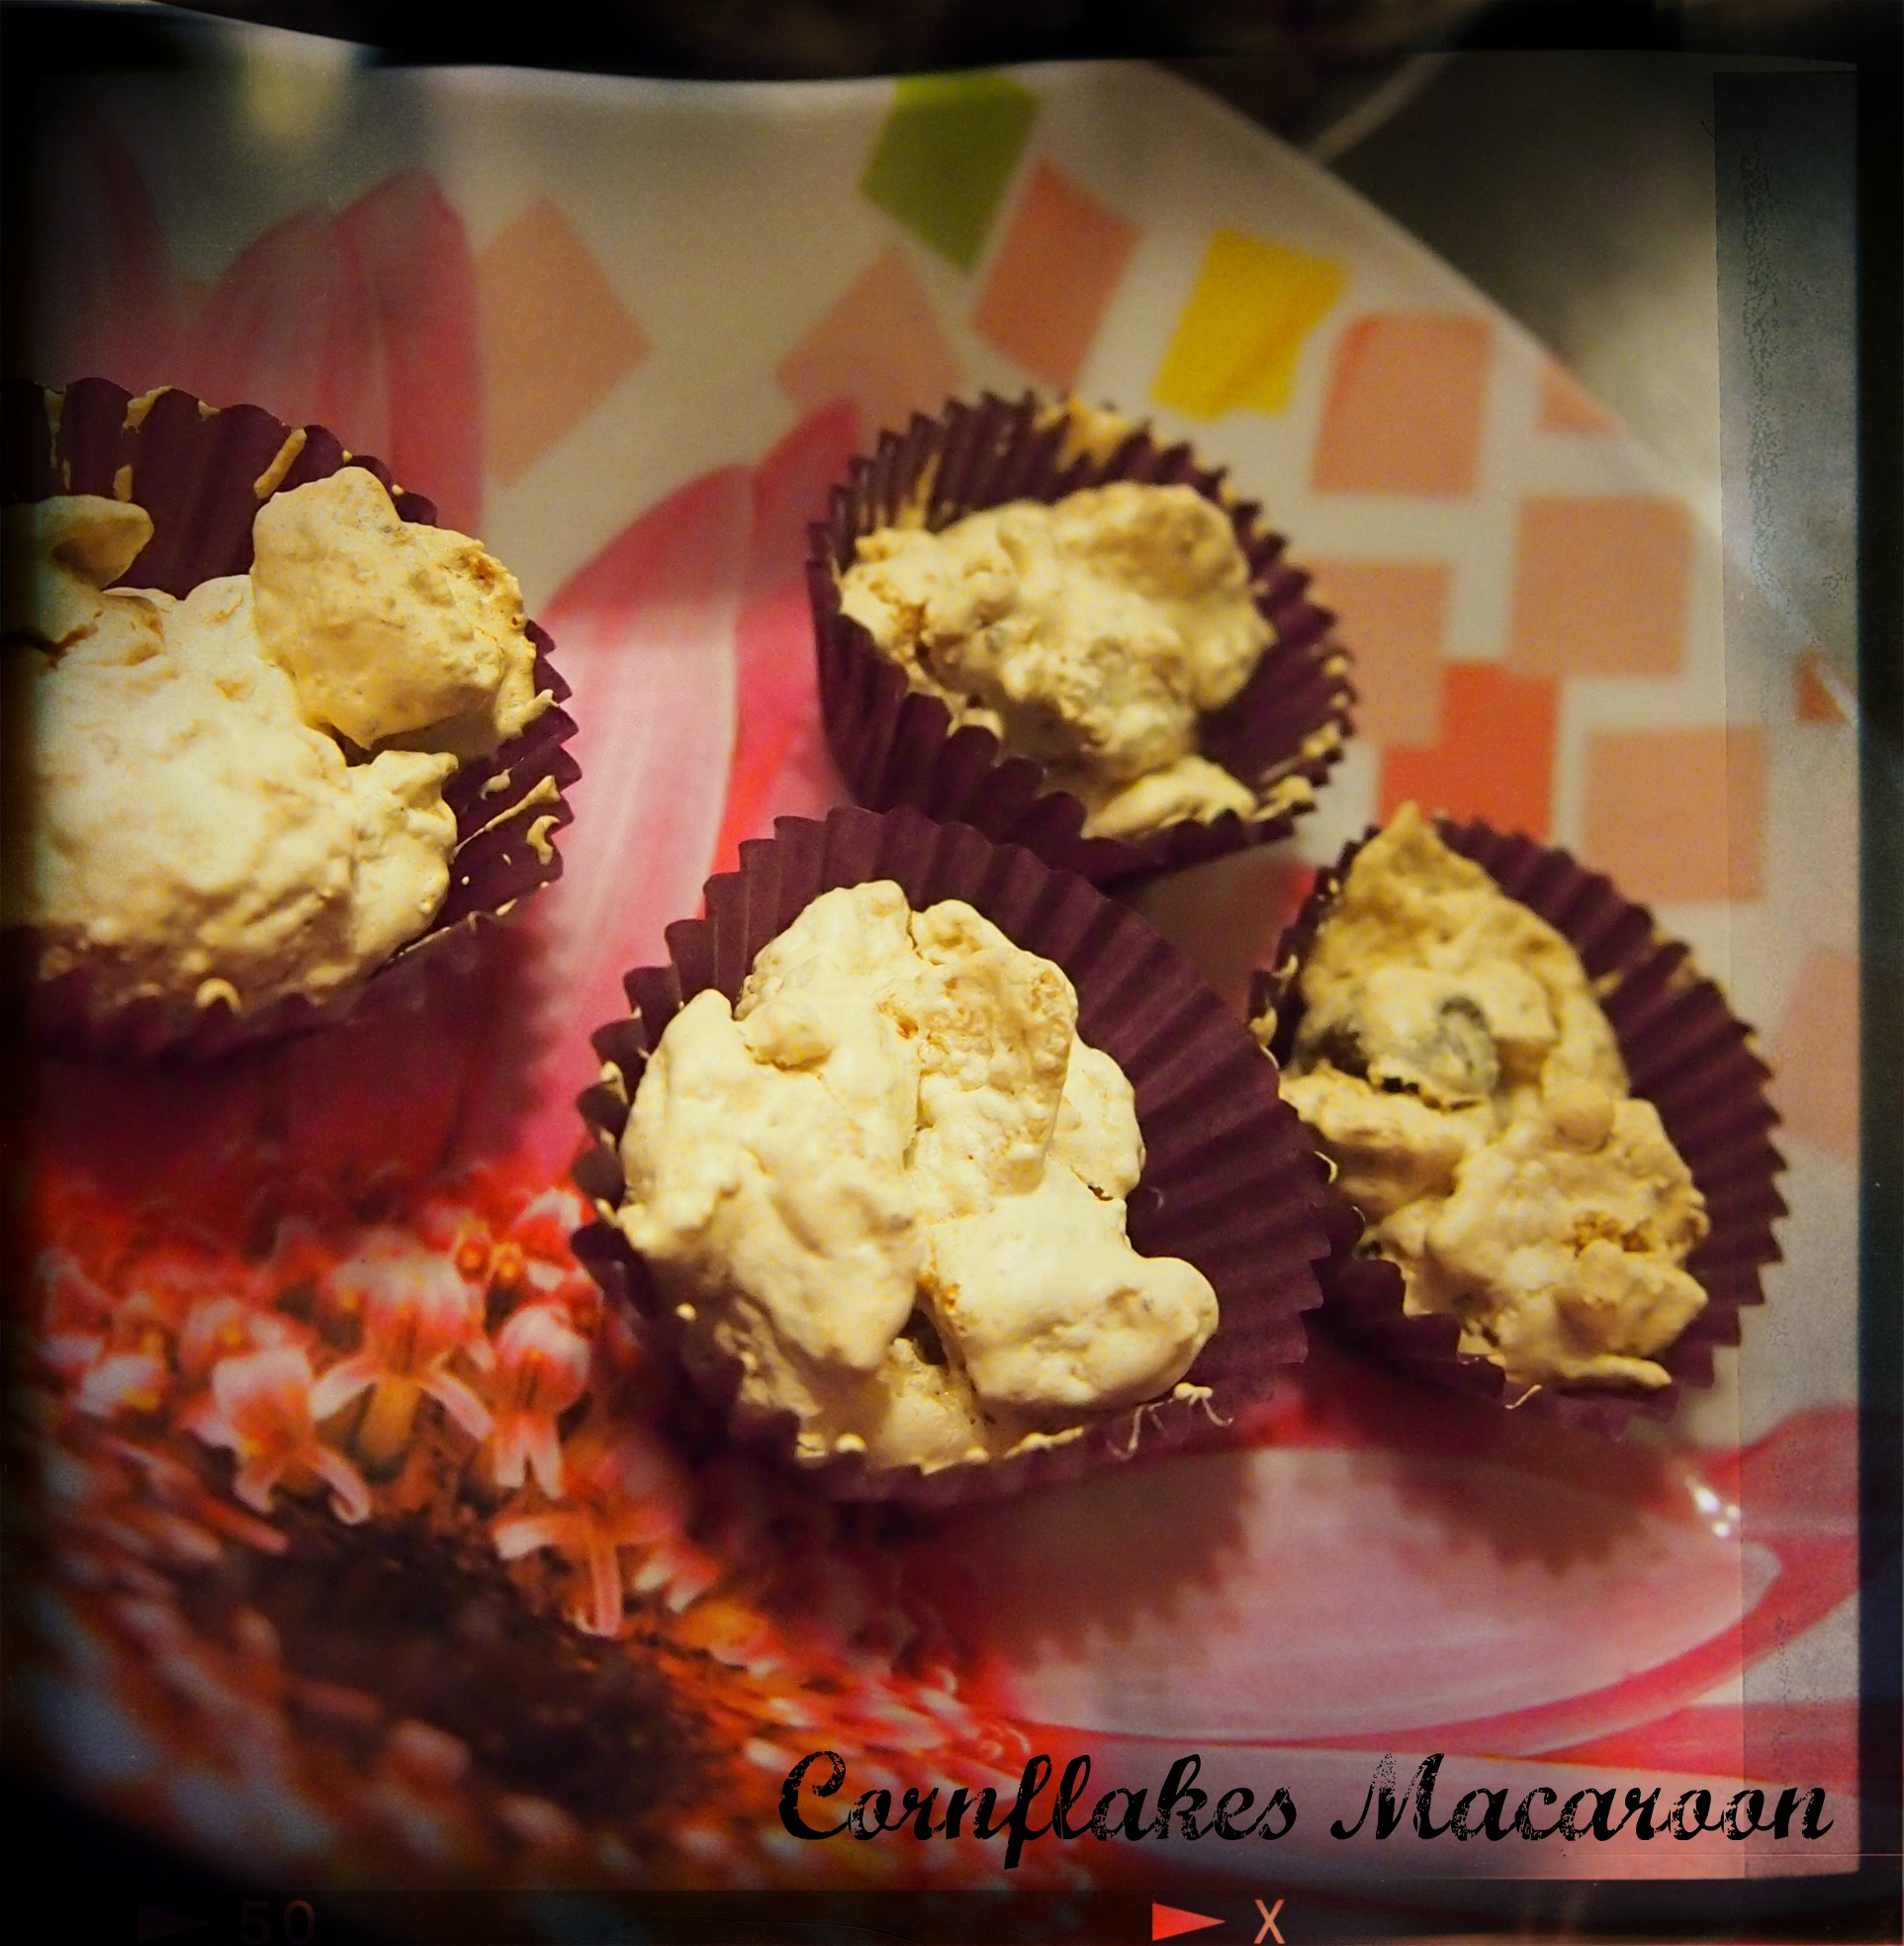 cornflakes macaroon